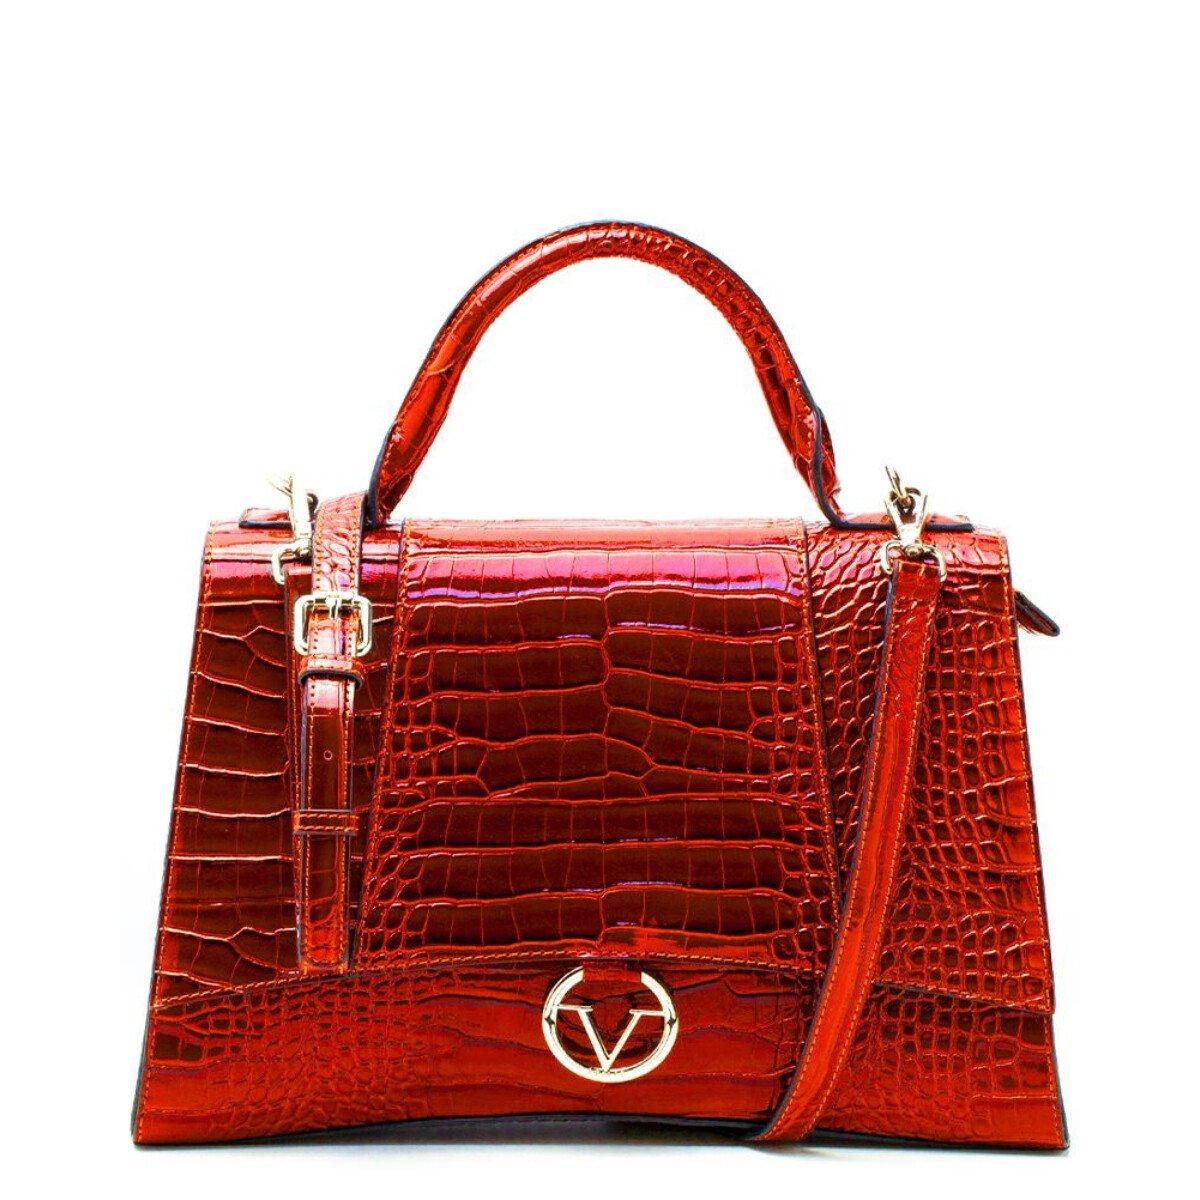 19v69 Italia Women's Handbag Various Colours 319022 - red UNICA